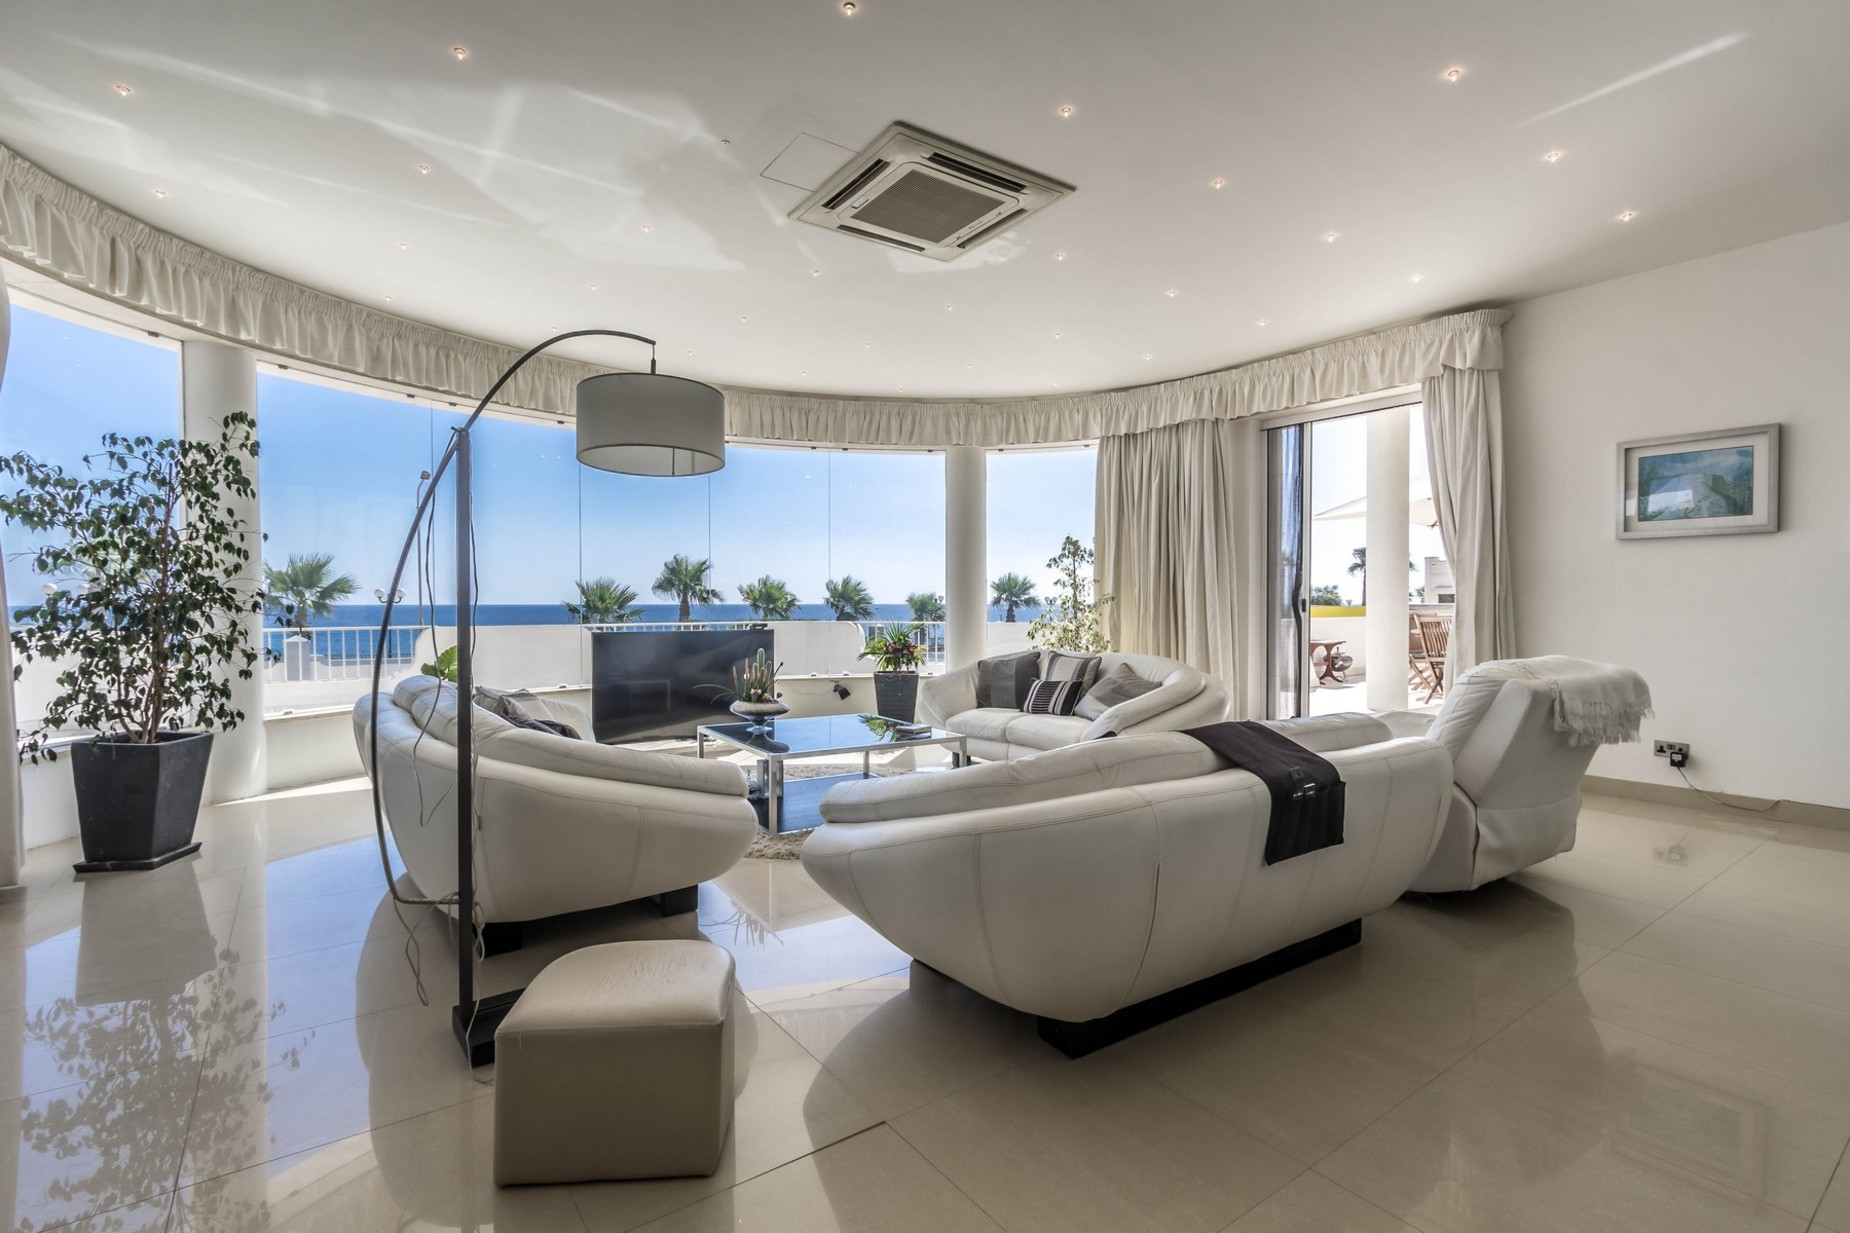 3 bed Villa For Sale in Marsascala, Marsascala - thumb 6